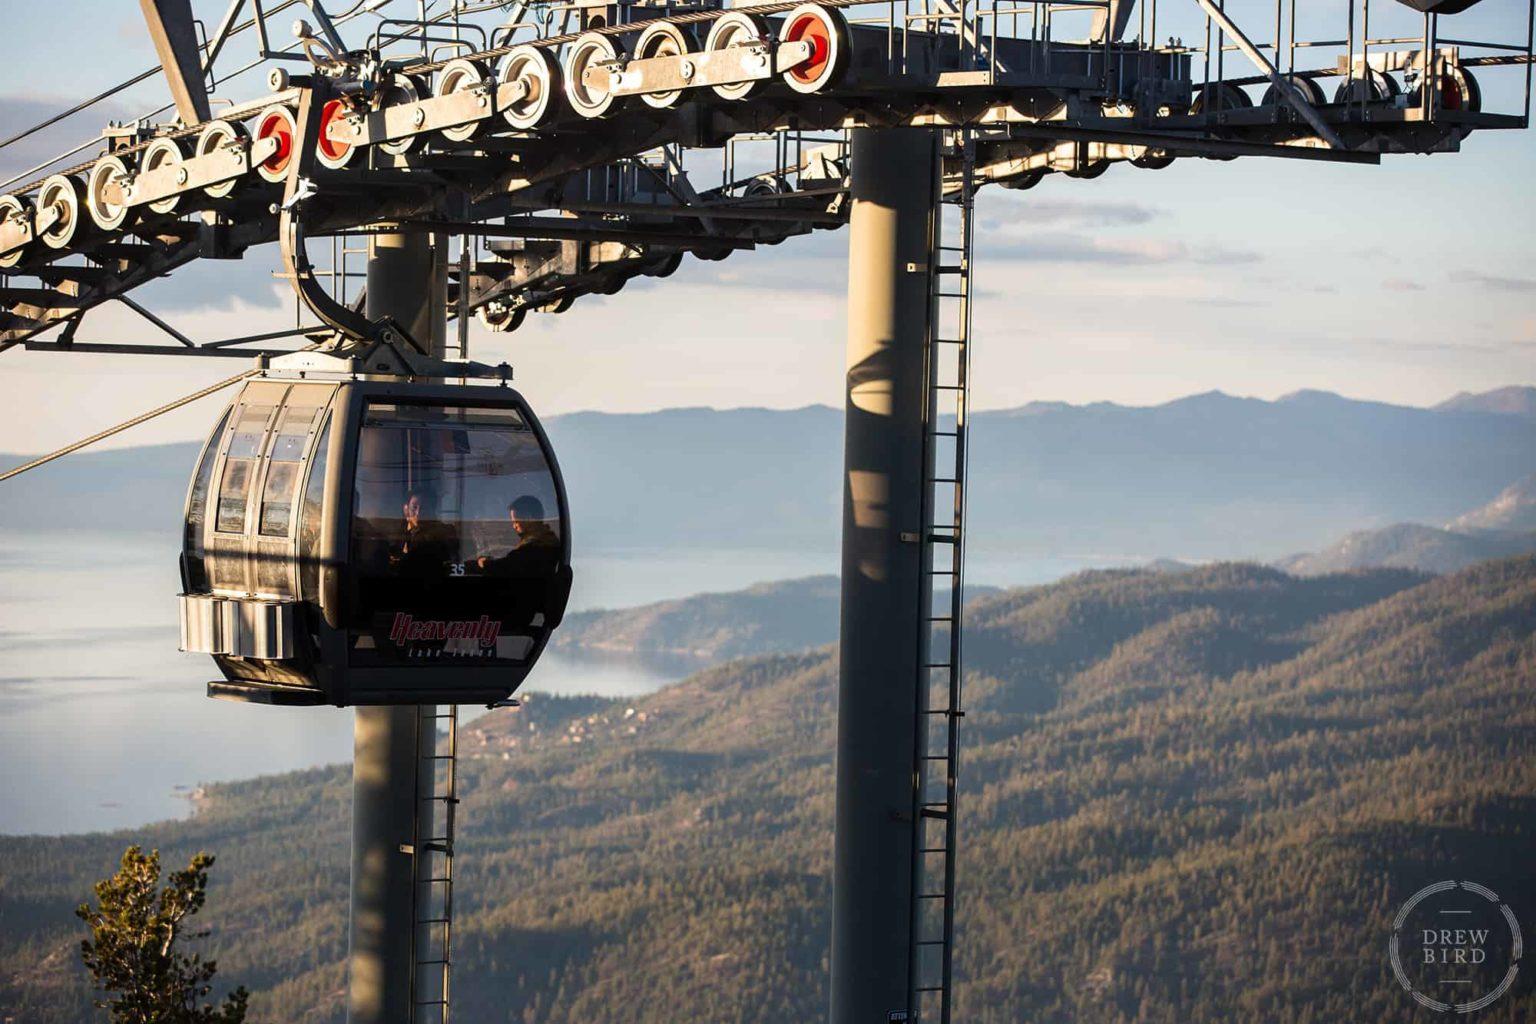 Gondola at Heavenly Ski Resort in Lake Tahoe California. San Francisco commercial photographer Drew Bird.